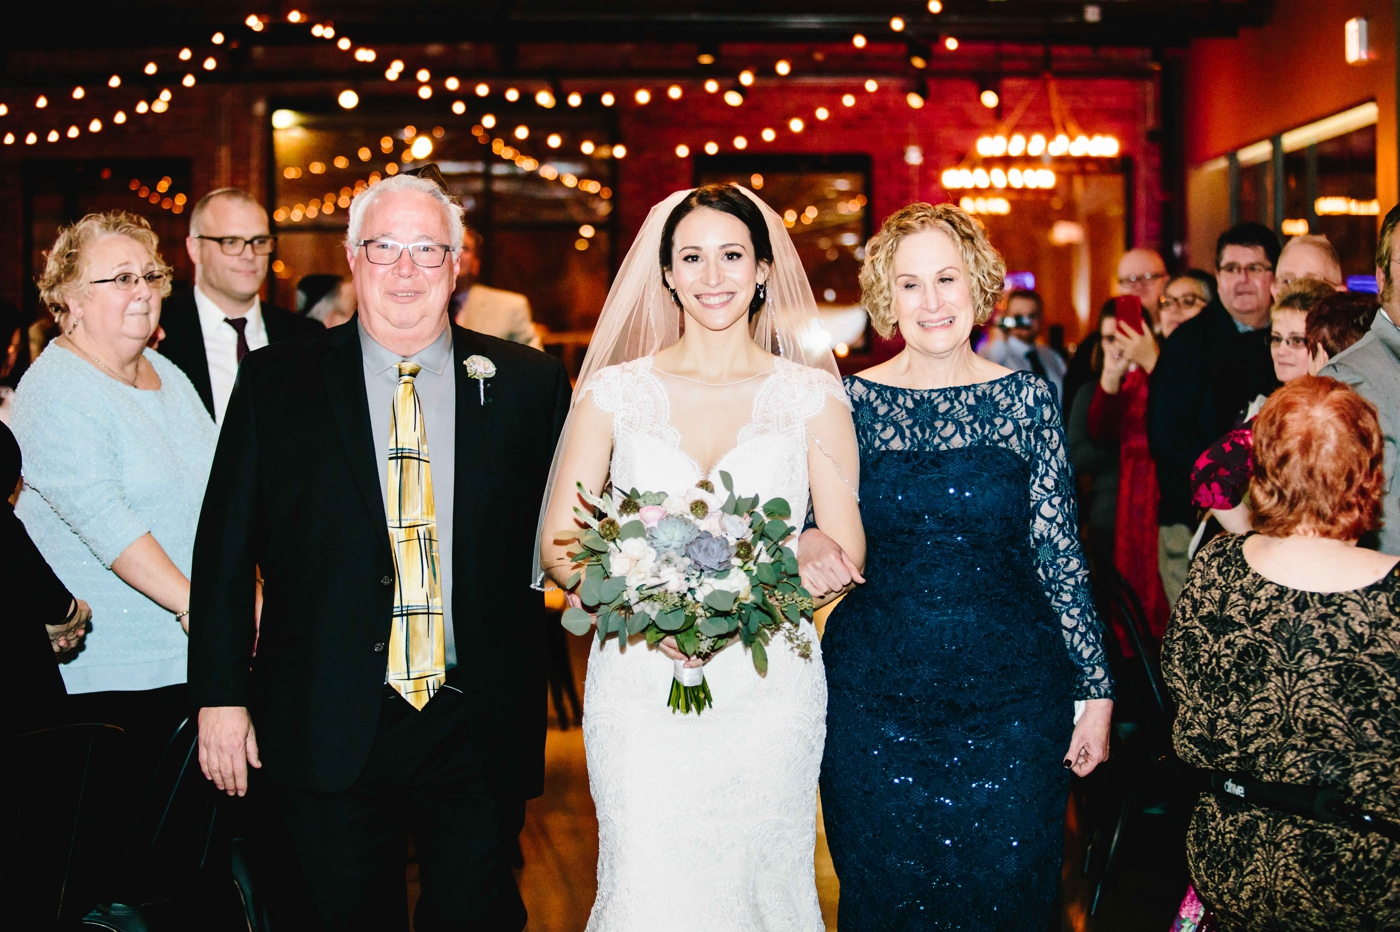 chicago-fine-art-wedding-photography-lintelman33